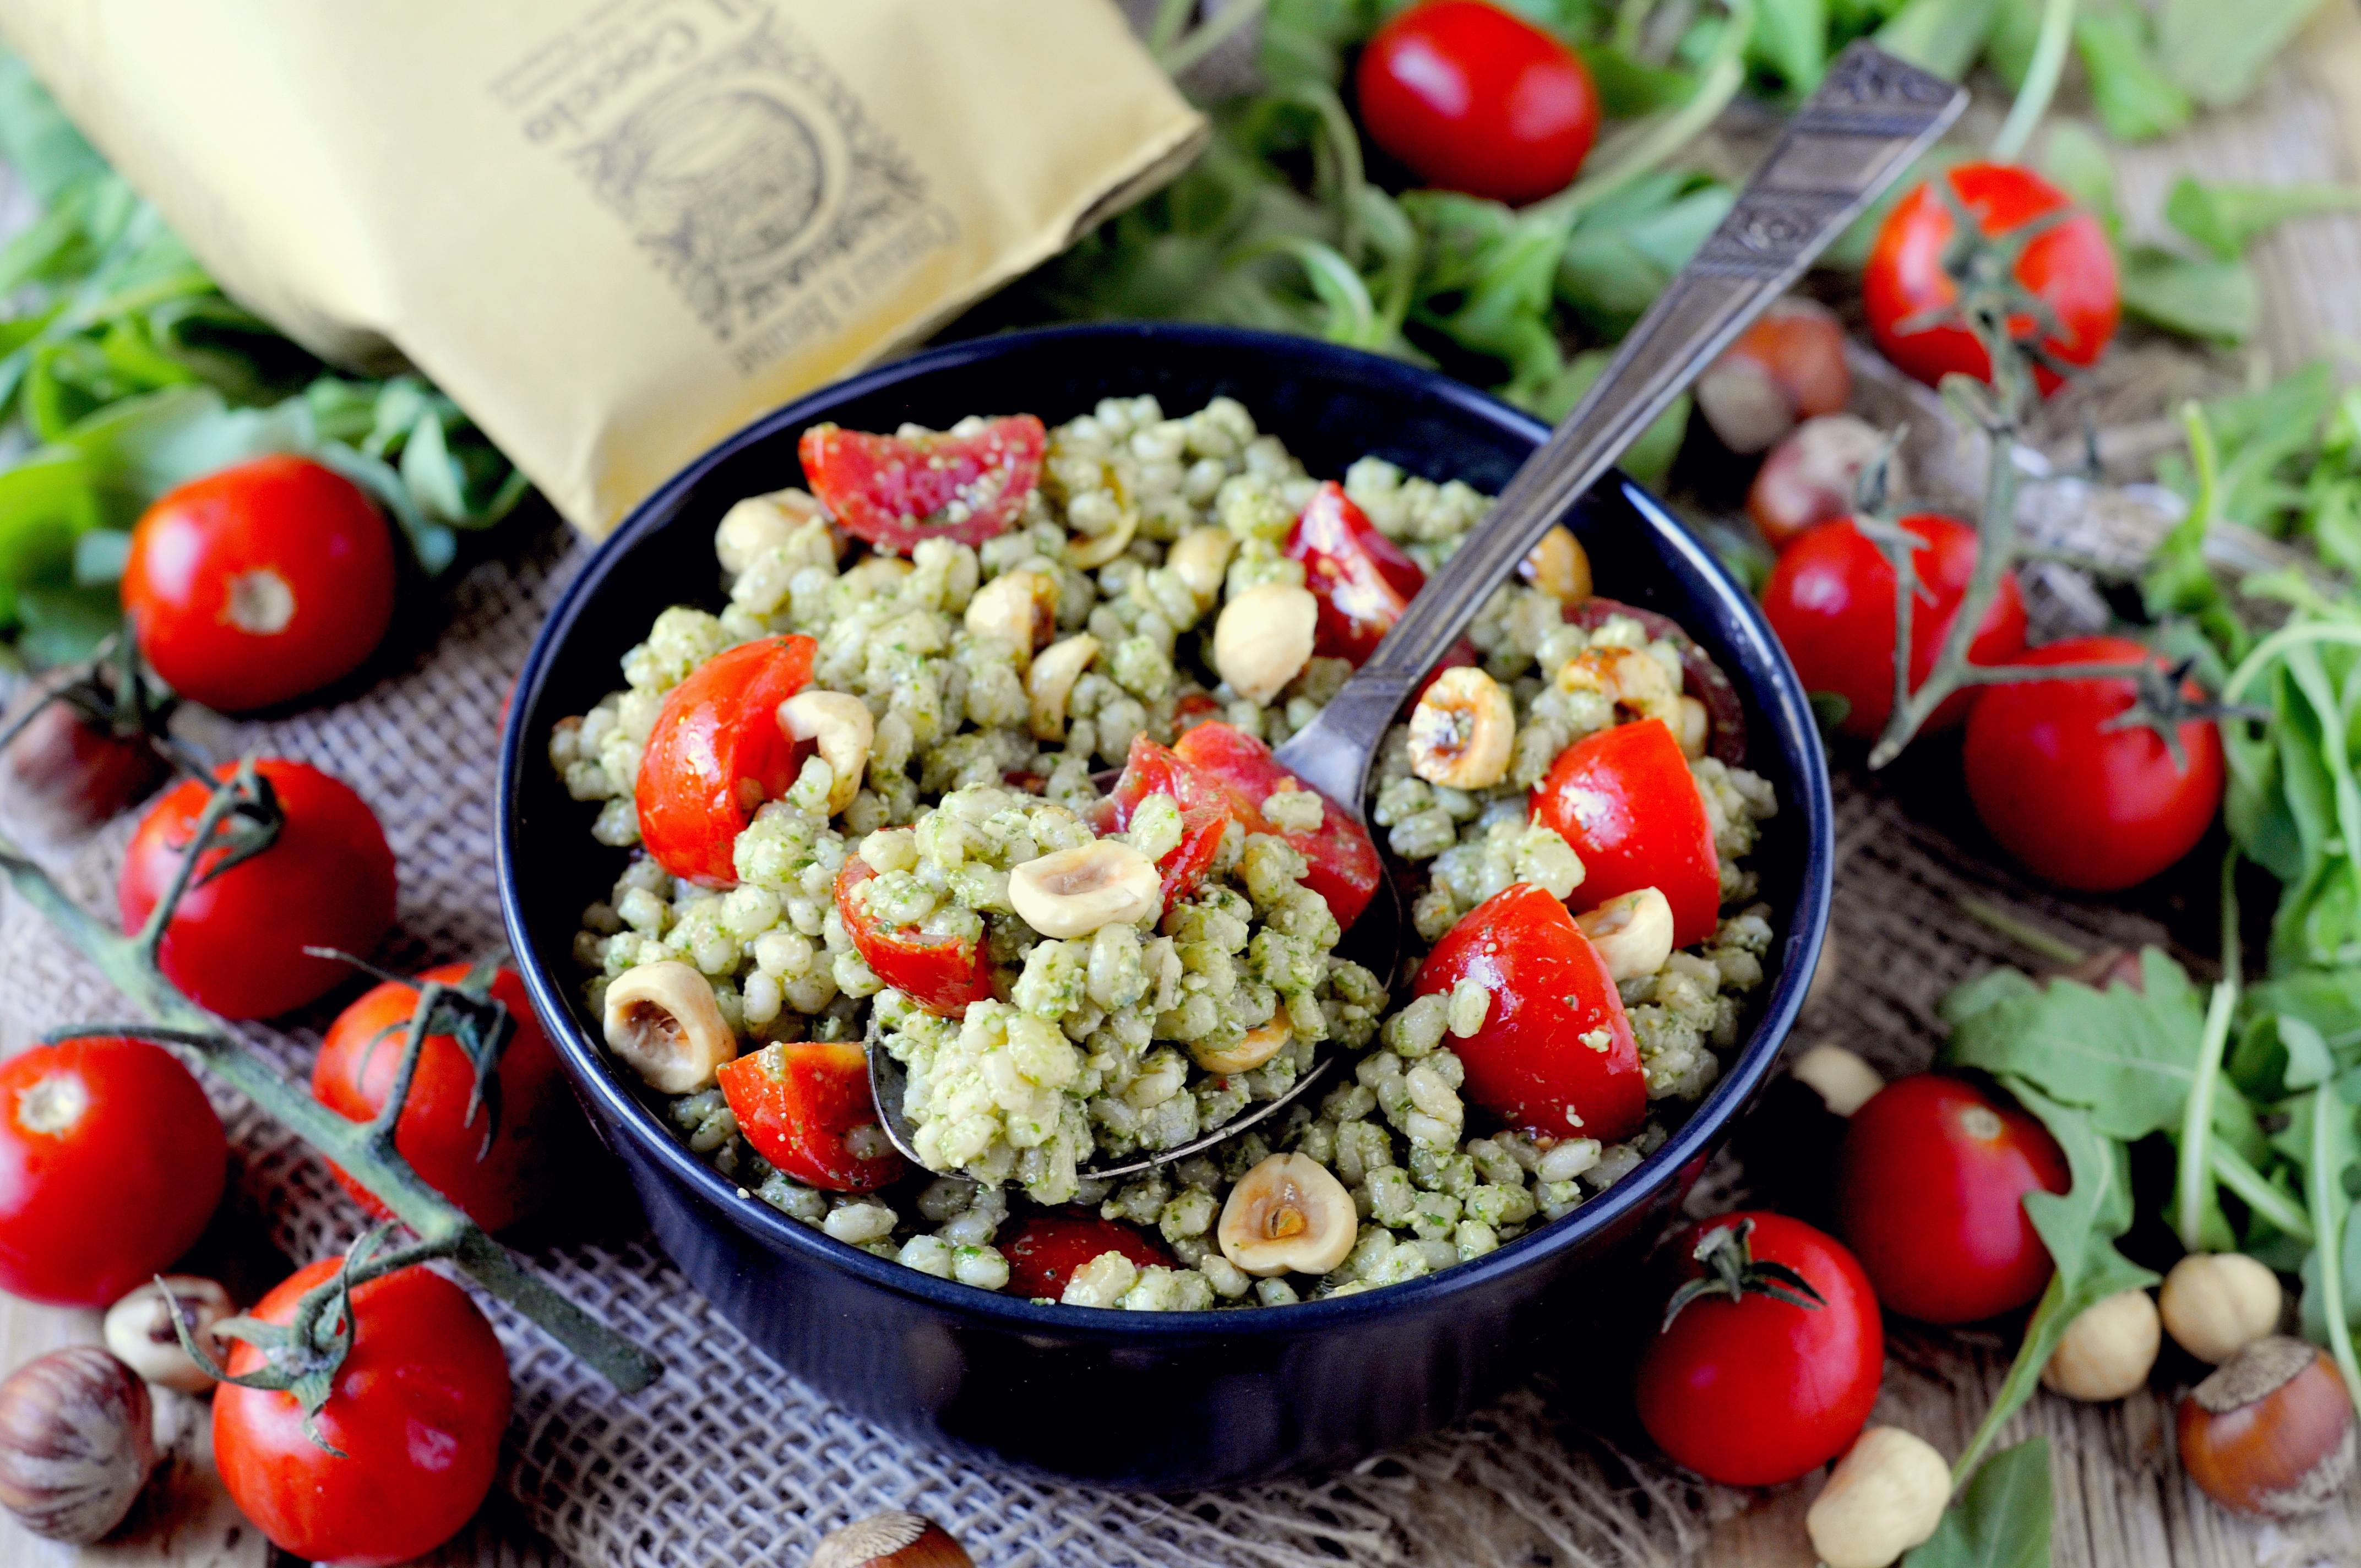 Ricette Orzo Vegetariano.Insalata D Orzo Vegetariana 5 Ricette Food Blog